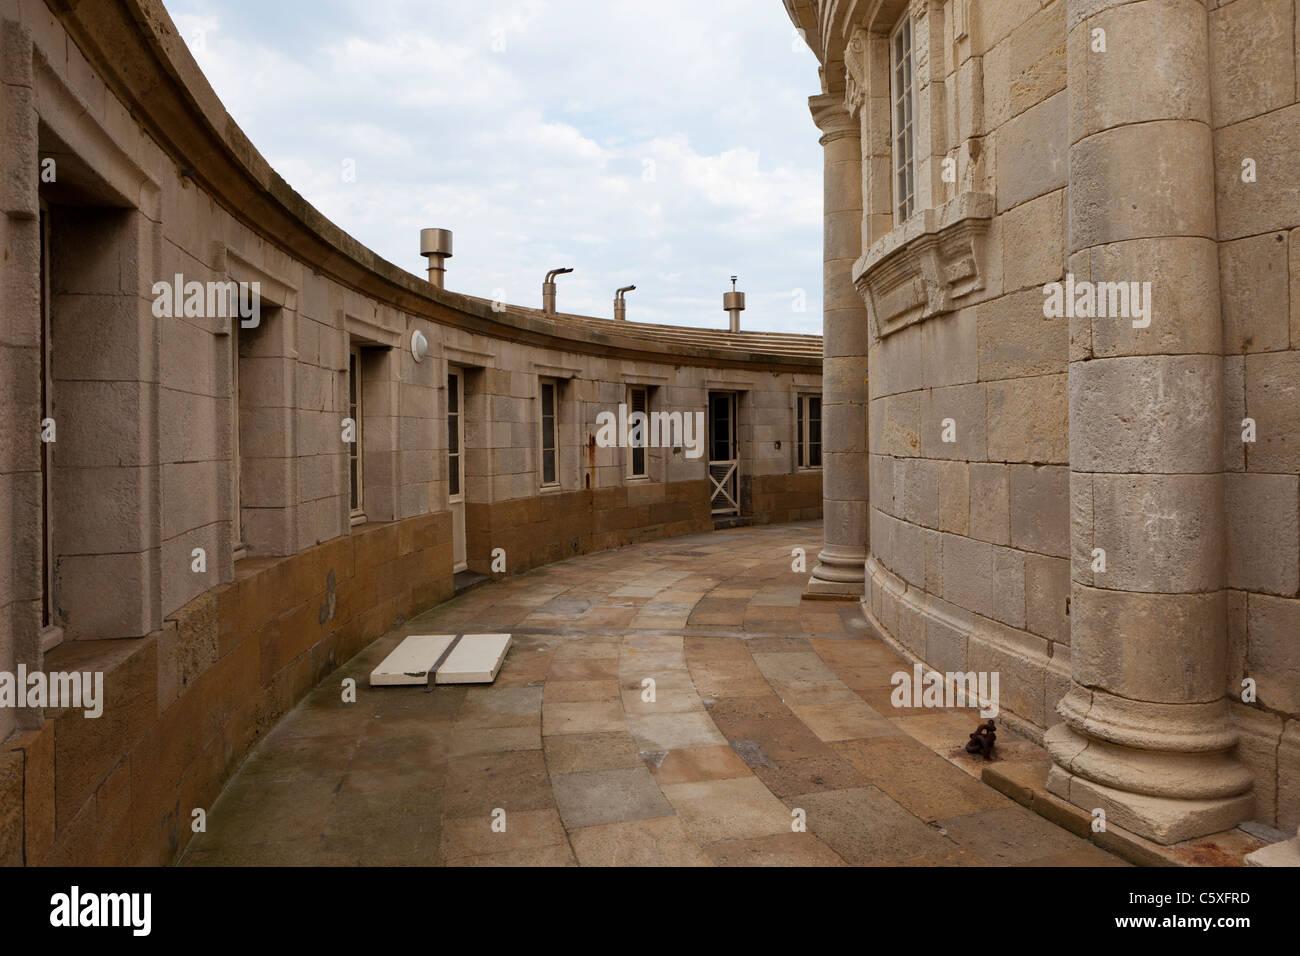 Lighthouse cordouan charente king kings france louis XIV - Stock Image